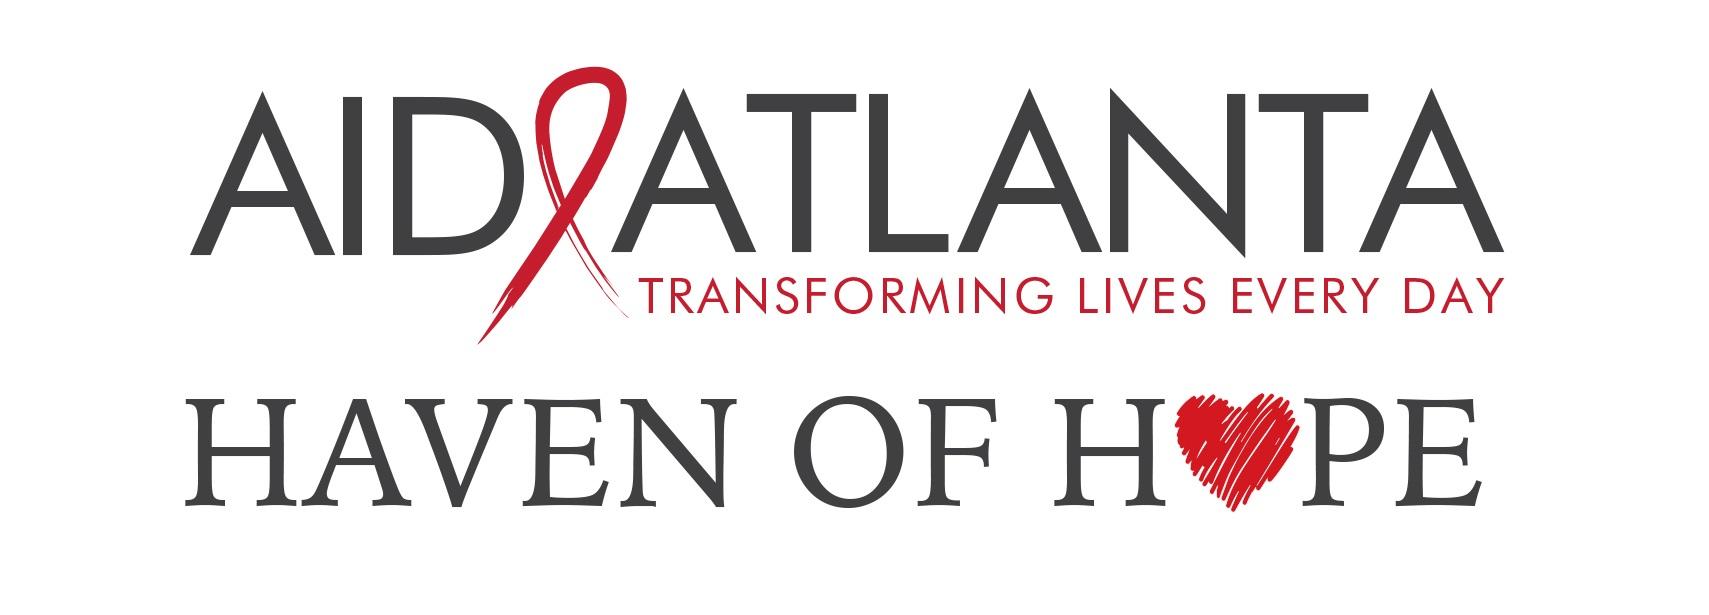 AID Atlanta Haven of Hope Logos.jpg